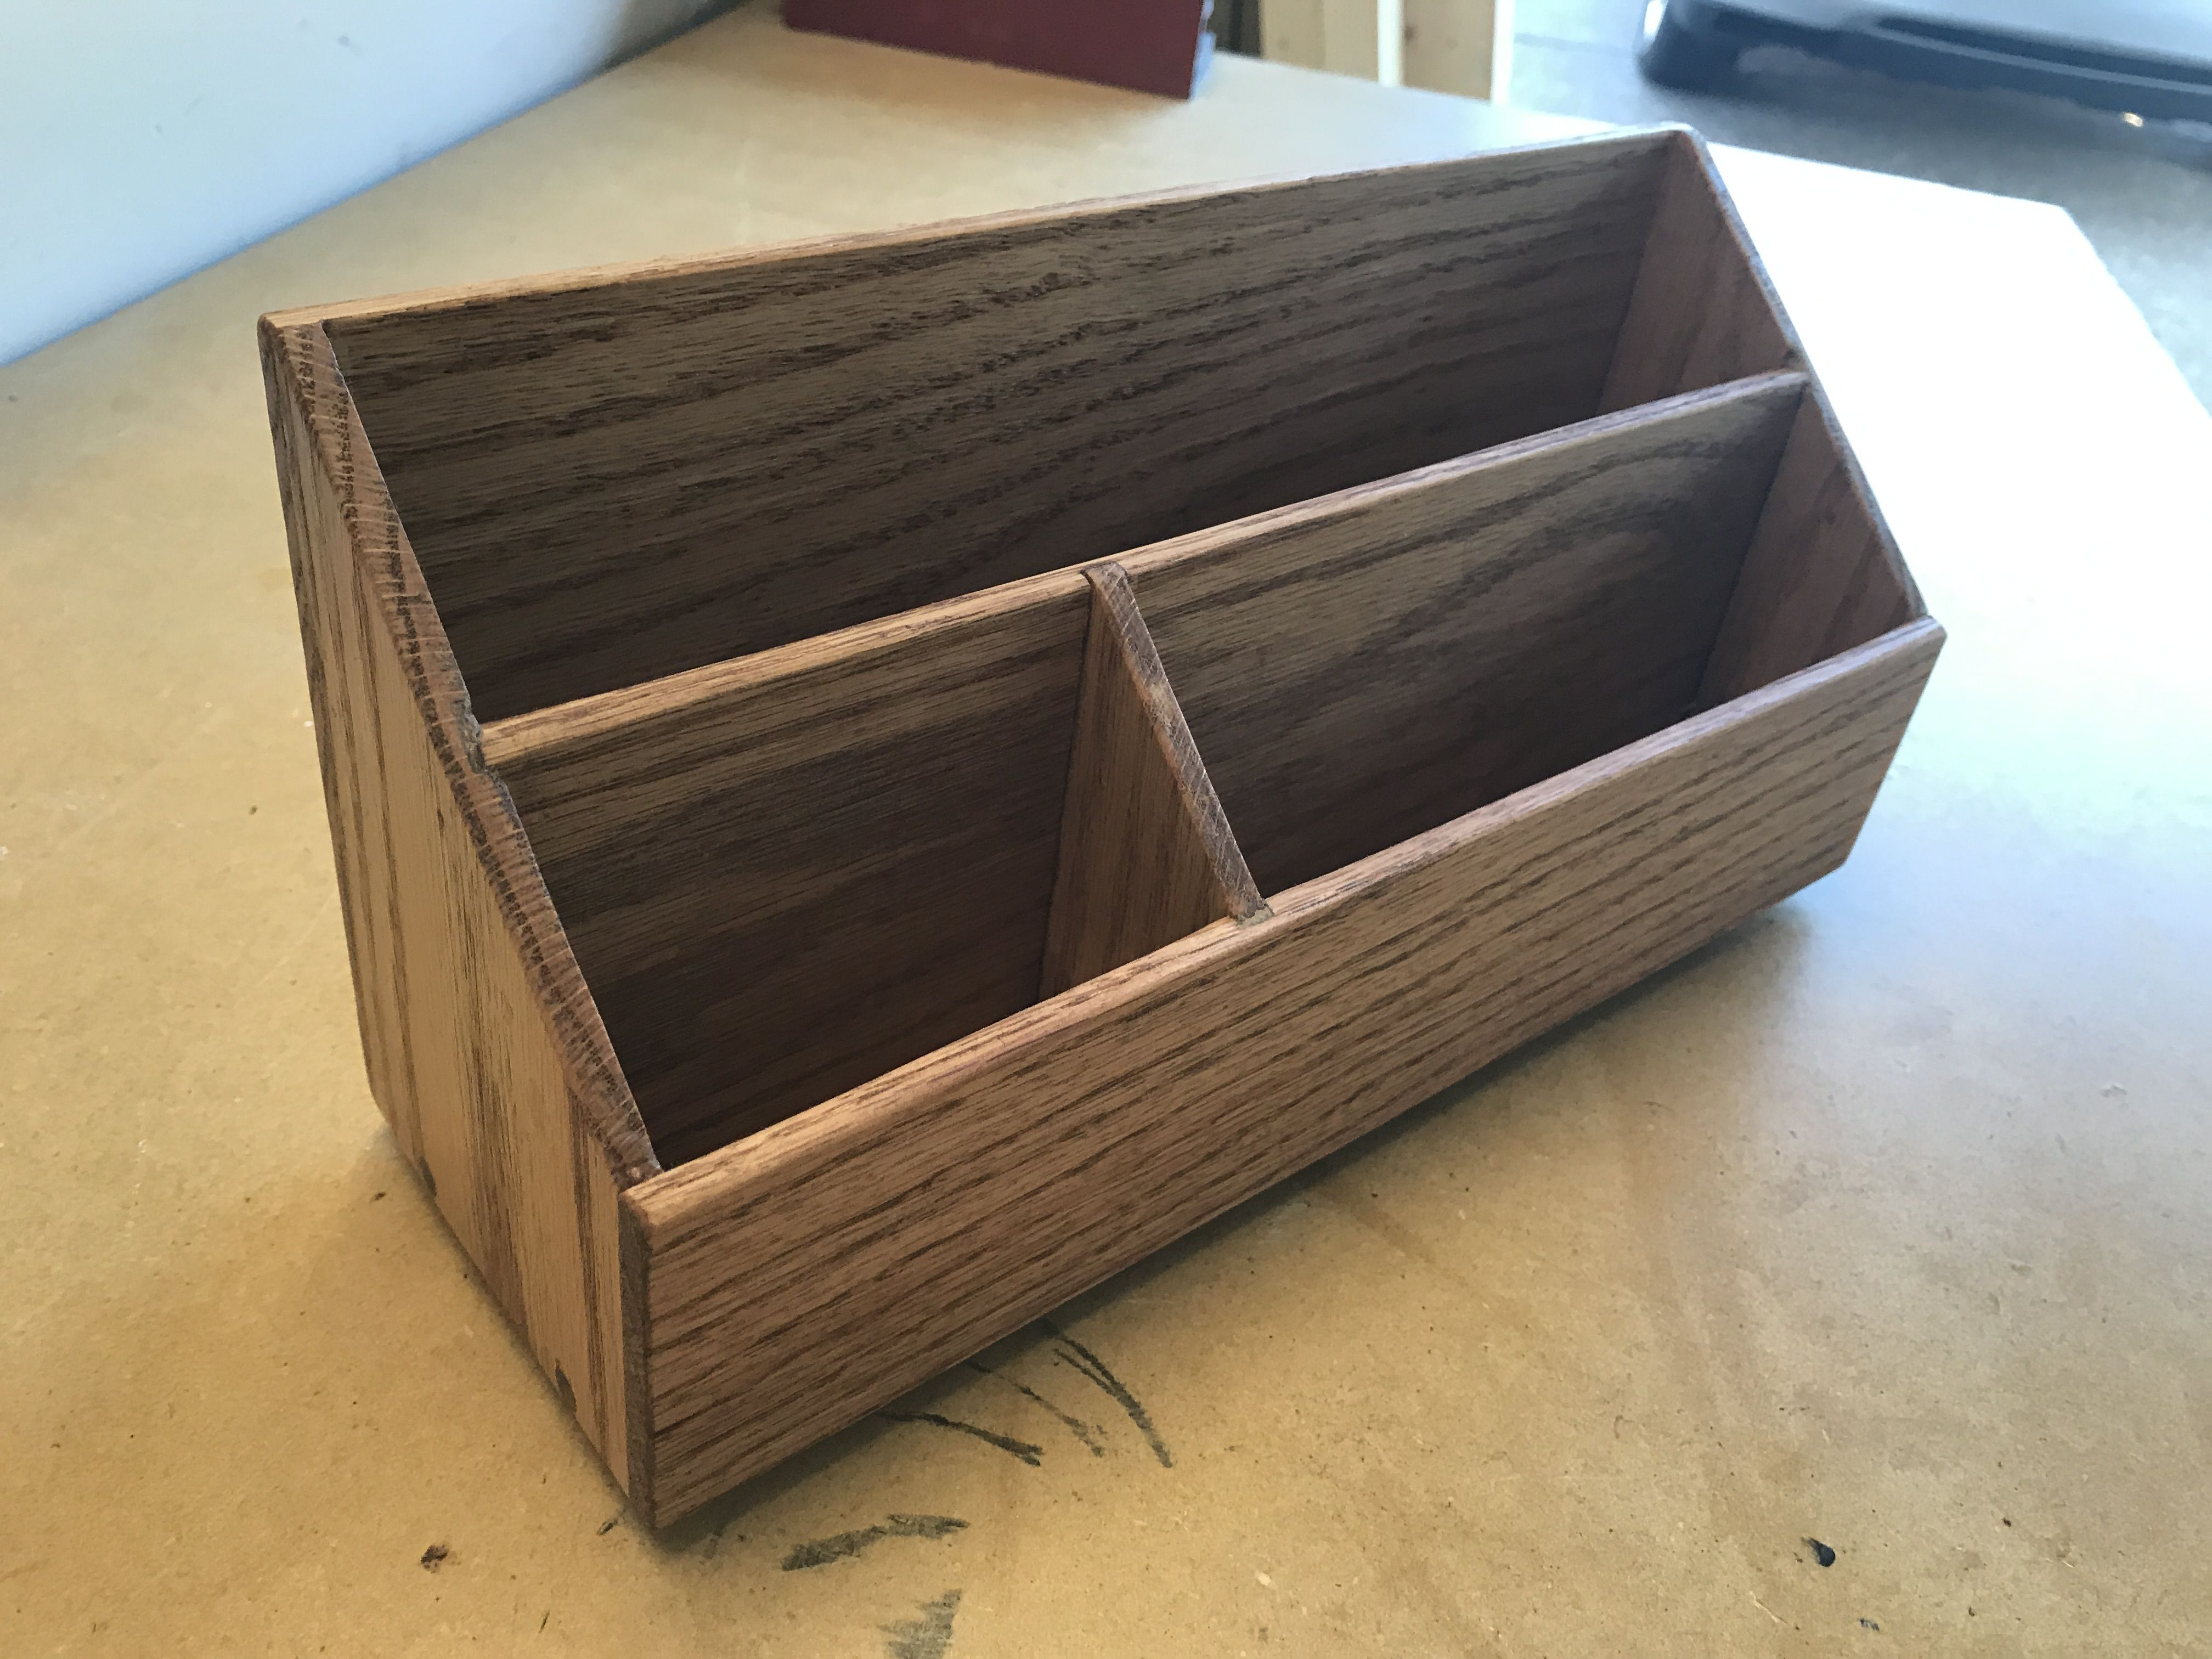 Countertop Mail Organizer Handmade Crafts Howto Diy Mail